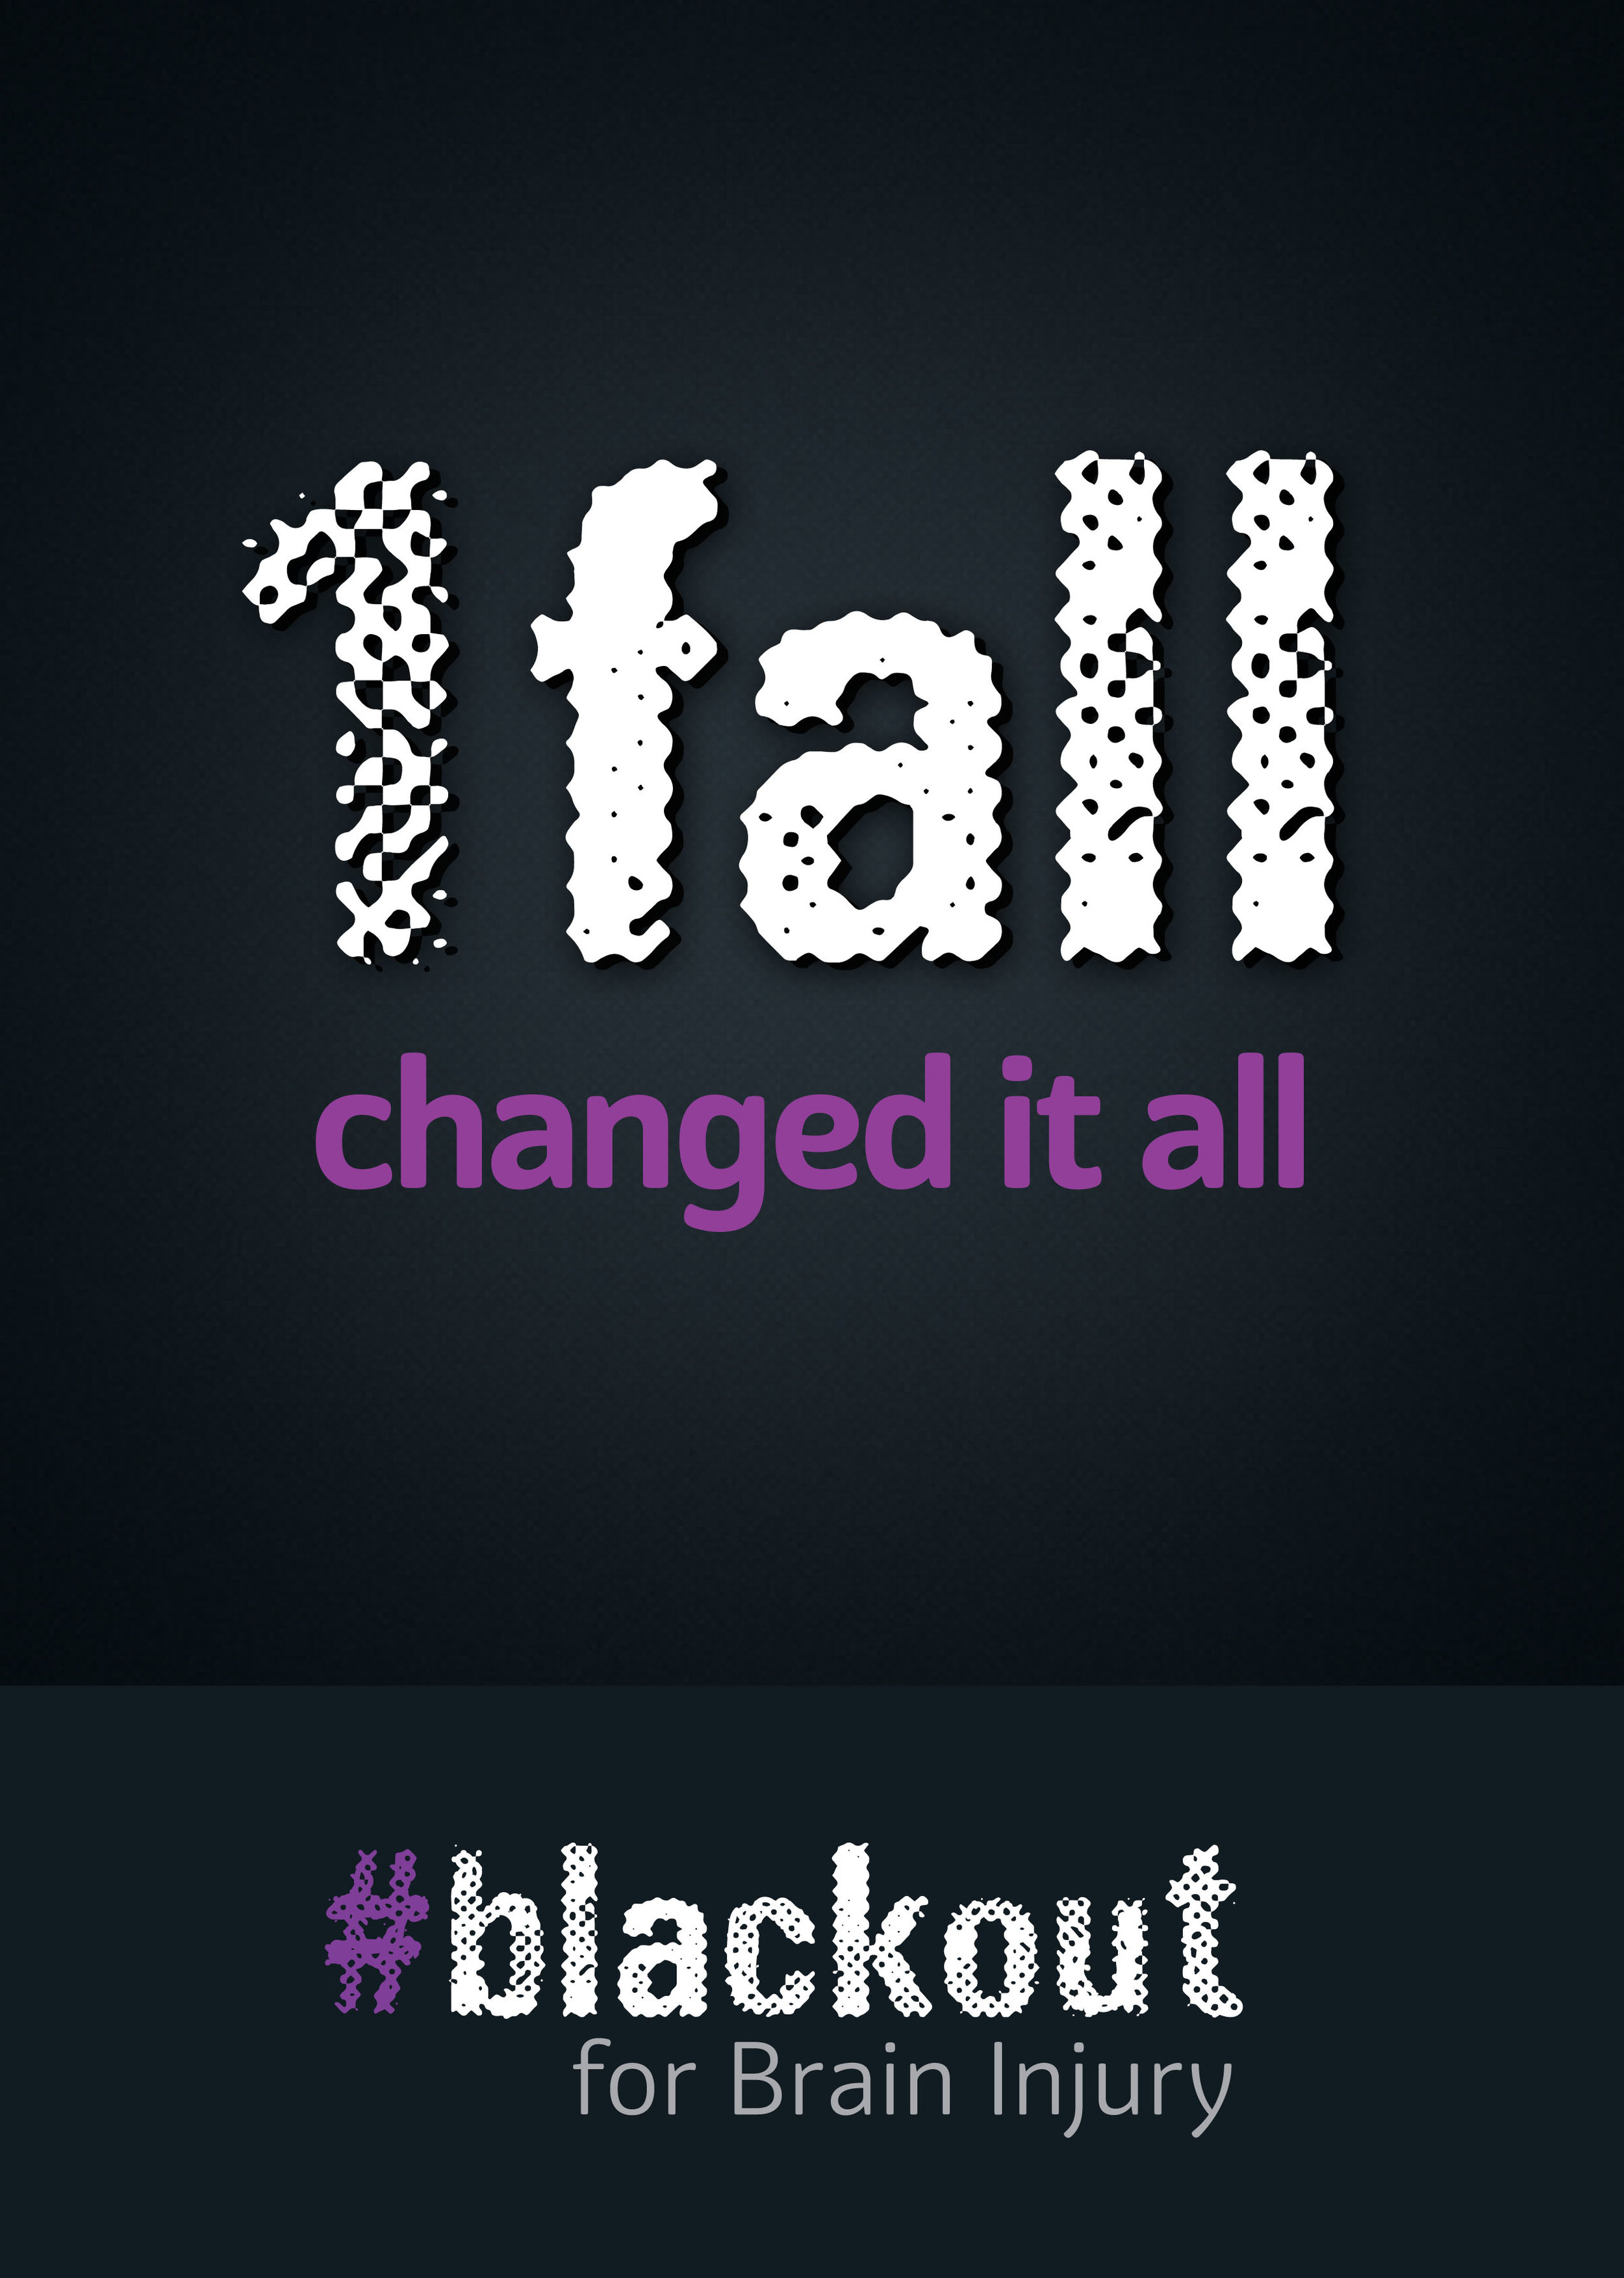 Blackout posters-2.jpg